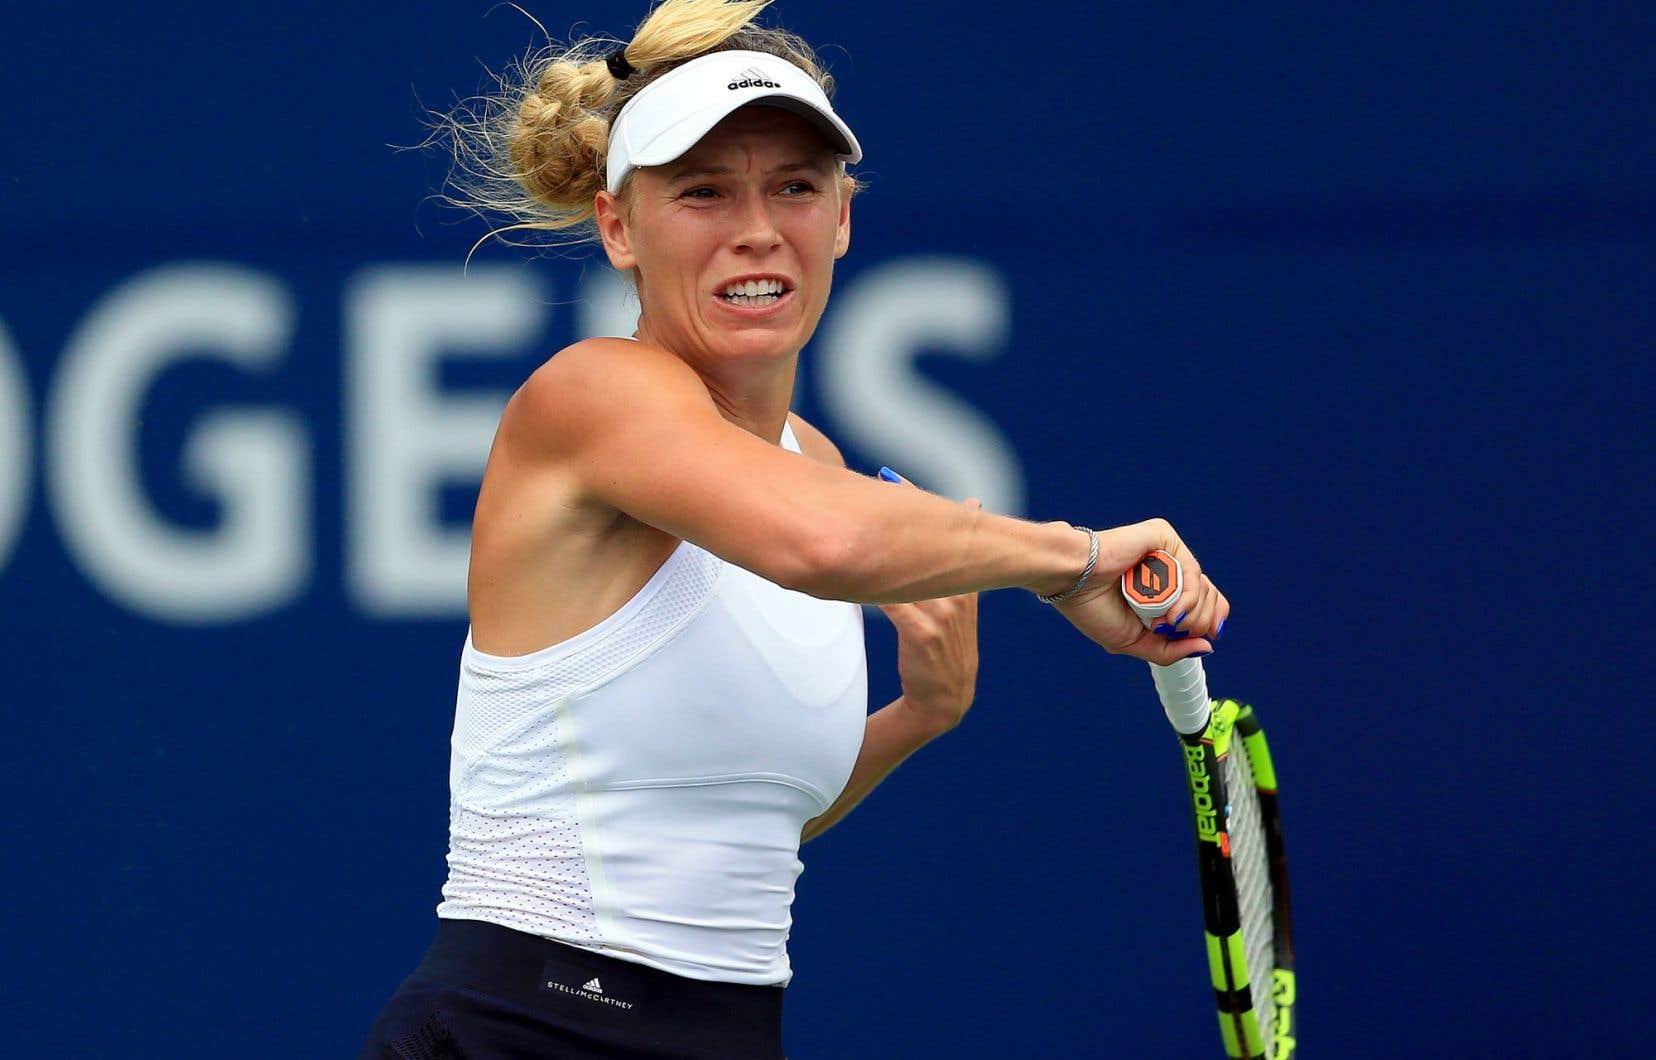 La joueuse de tennis Caroline Wozniacki